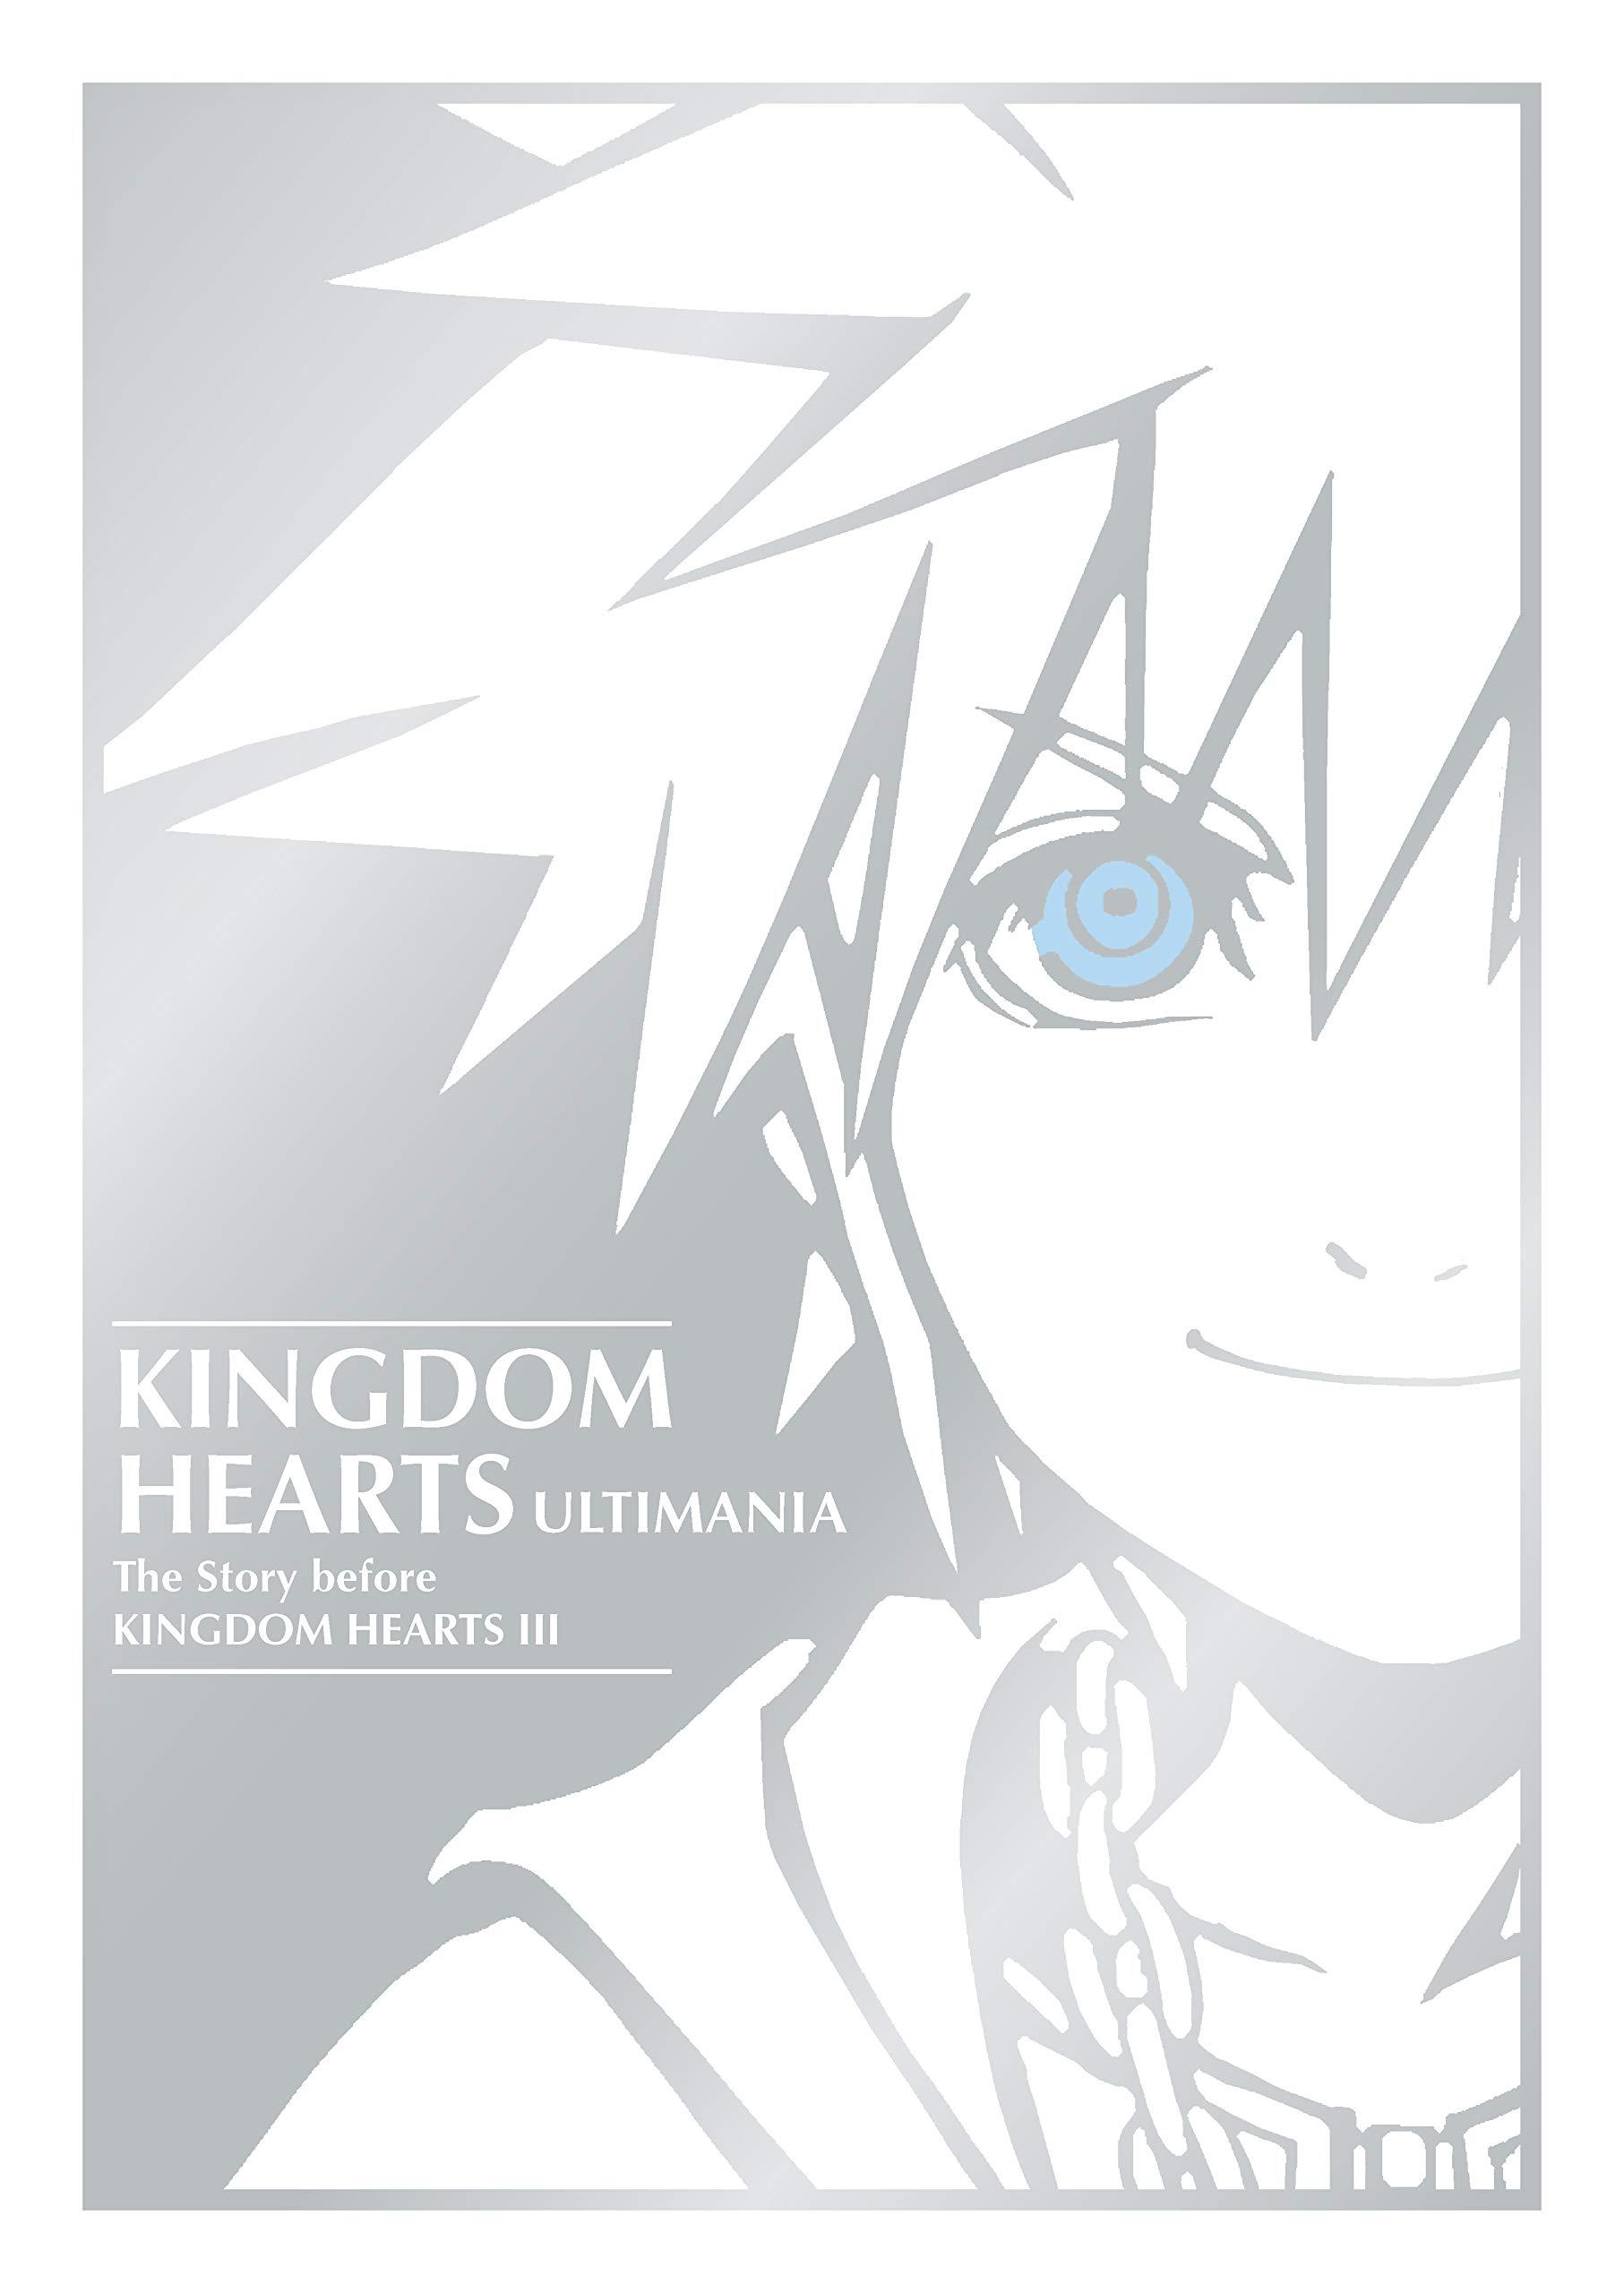 Kingdom Hearts Ultimania: The Story Before Kingdom Hearts